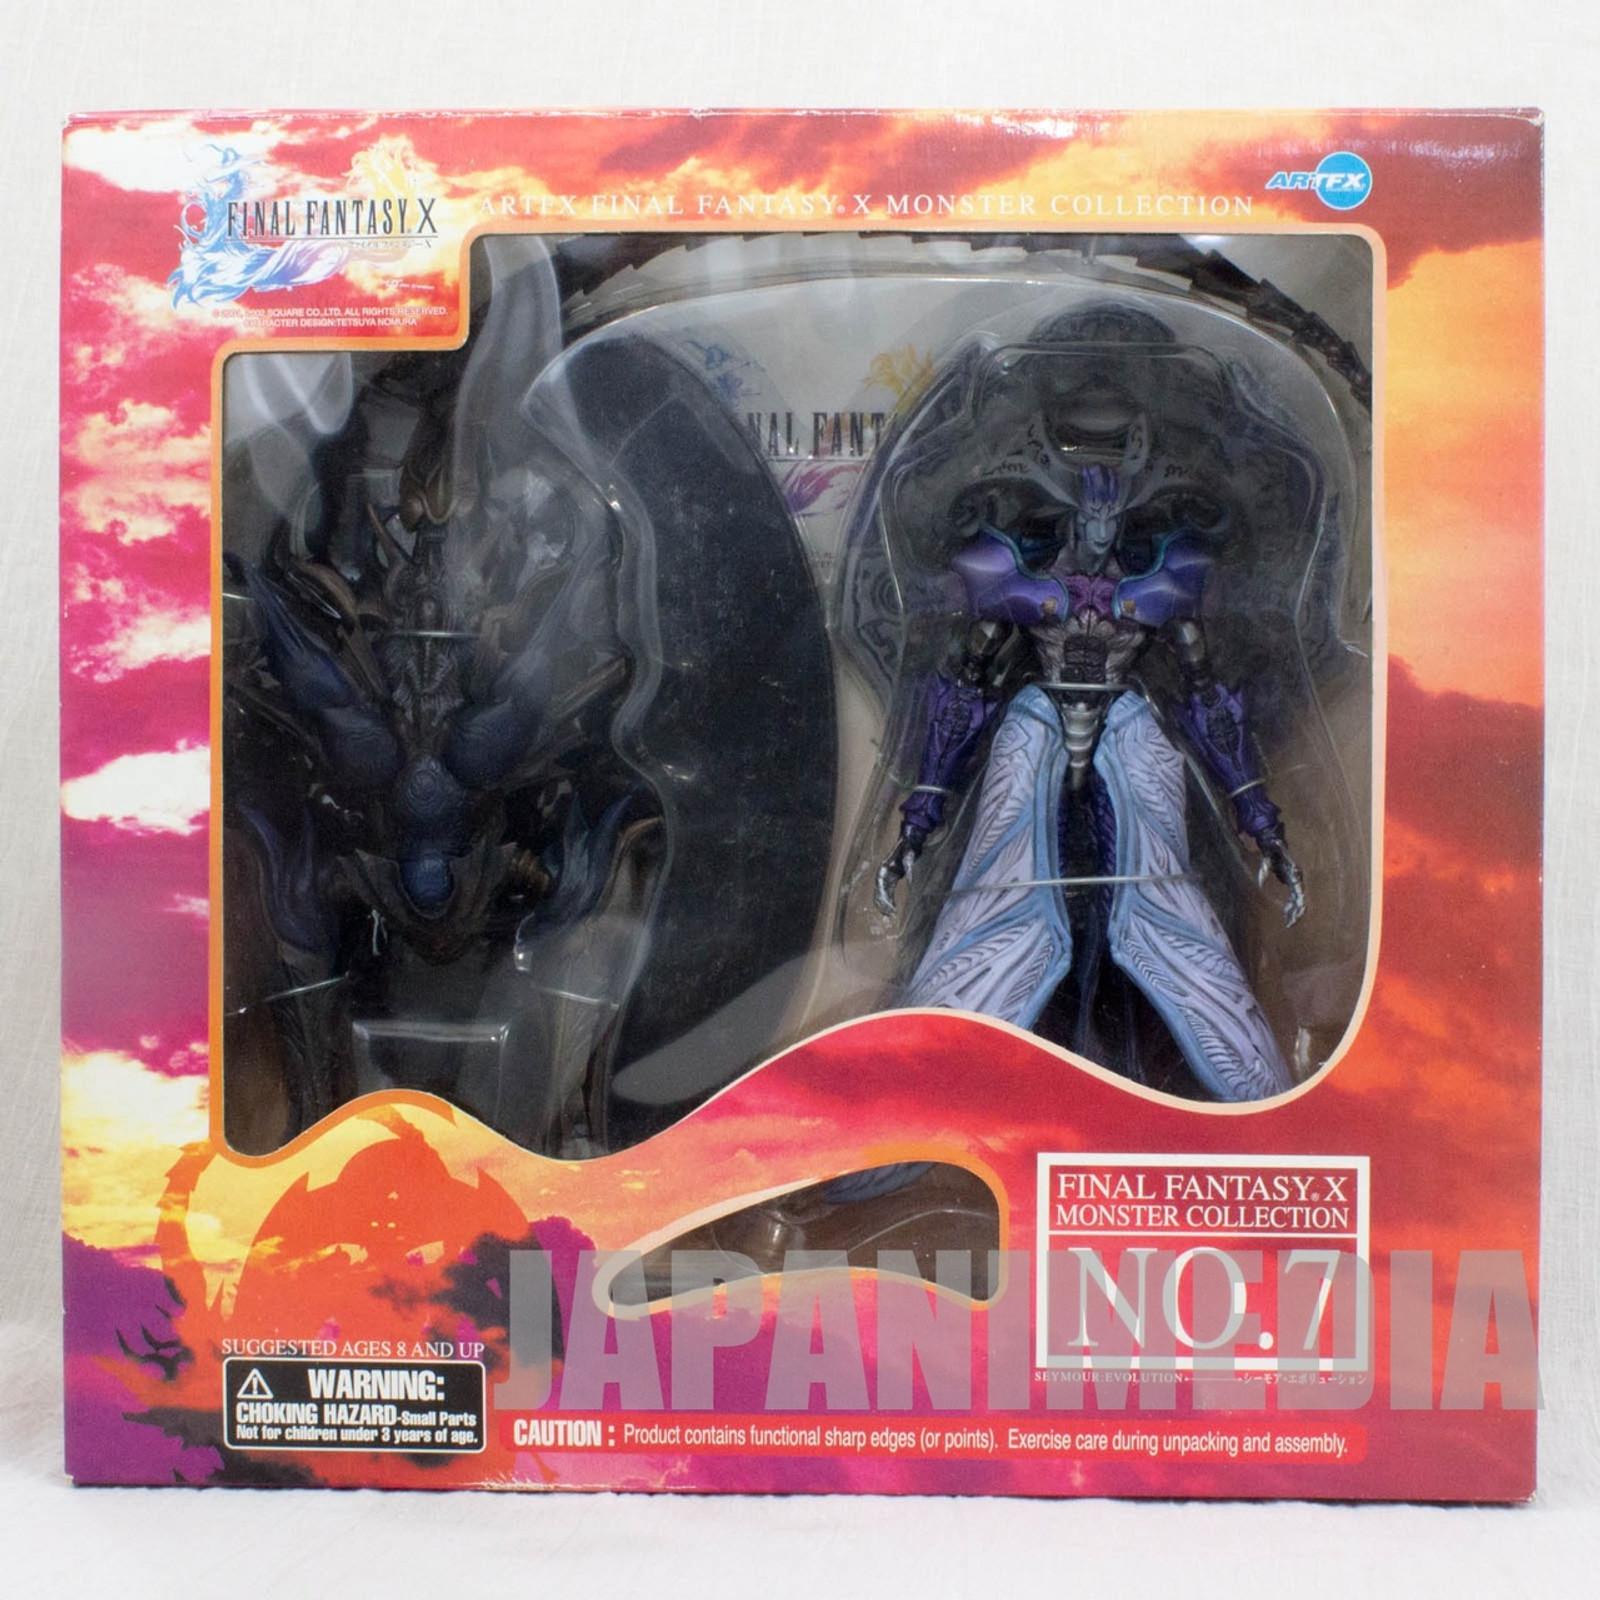 Final Fantasy X 10 Monster Collection #7 Seymour Evolution Figure ARTFX SQUARE